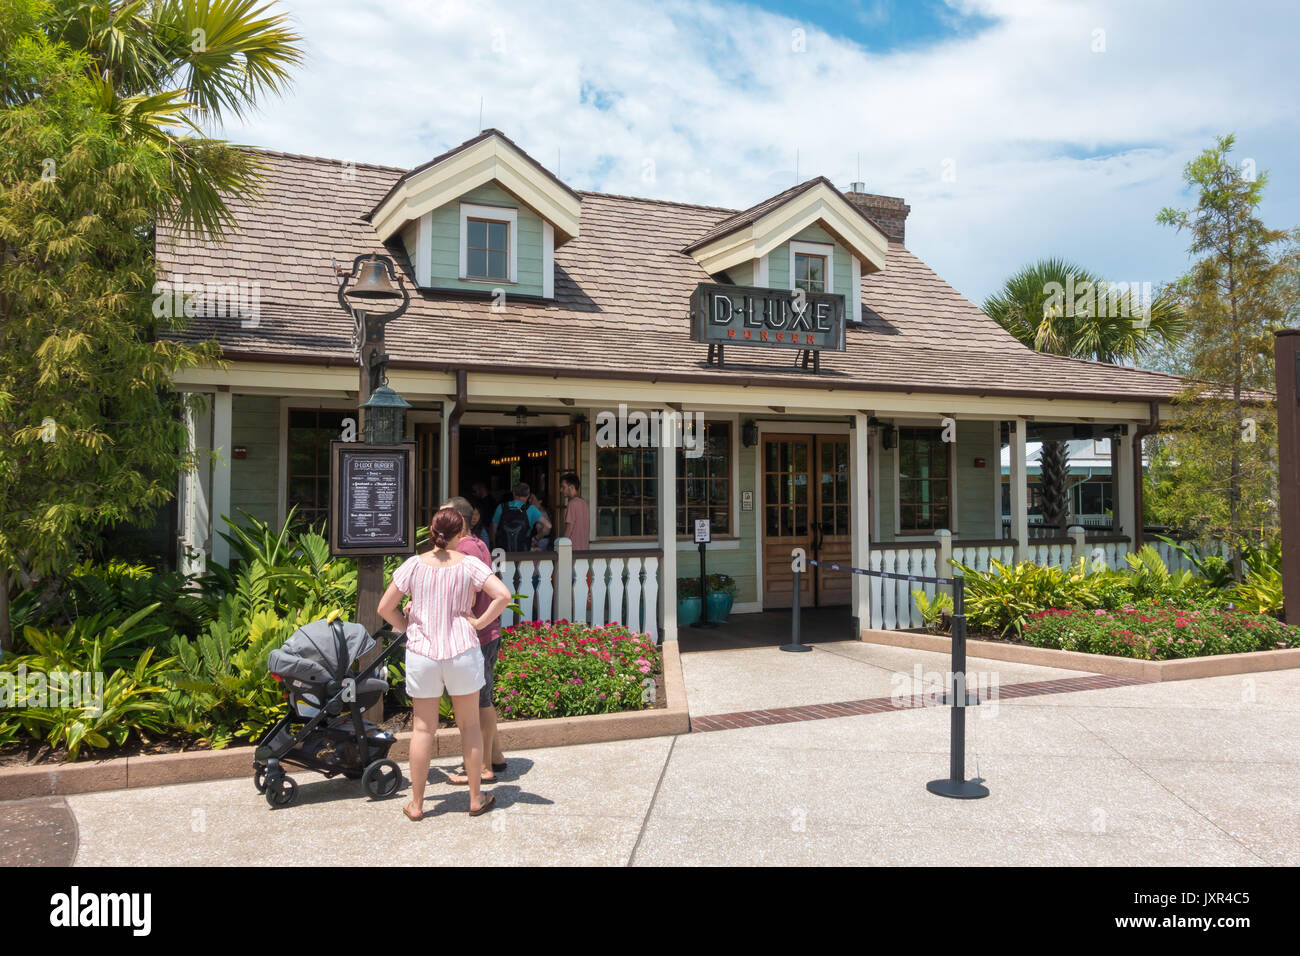 D-Luxe Burger at Disney Springs, Walt Disney World, Orlando, Florida. - Stock Image